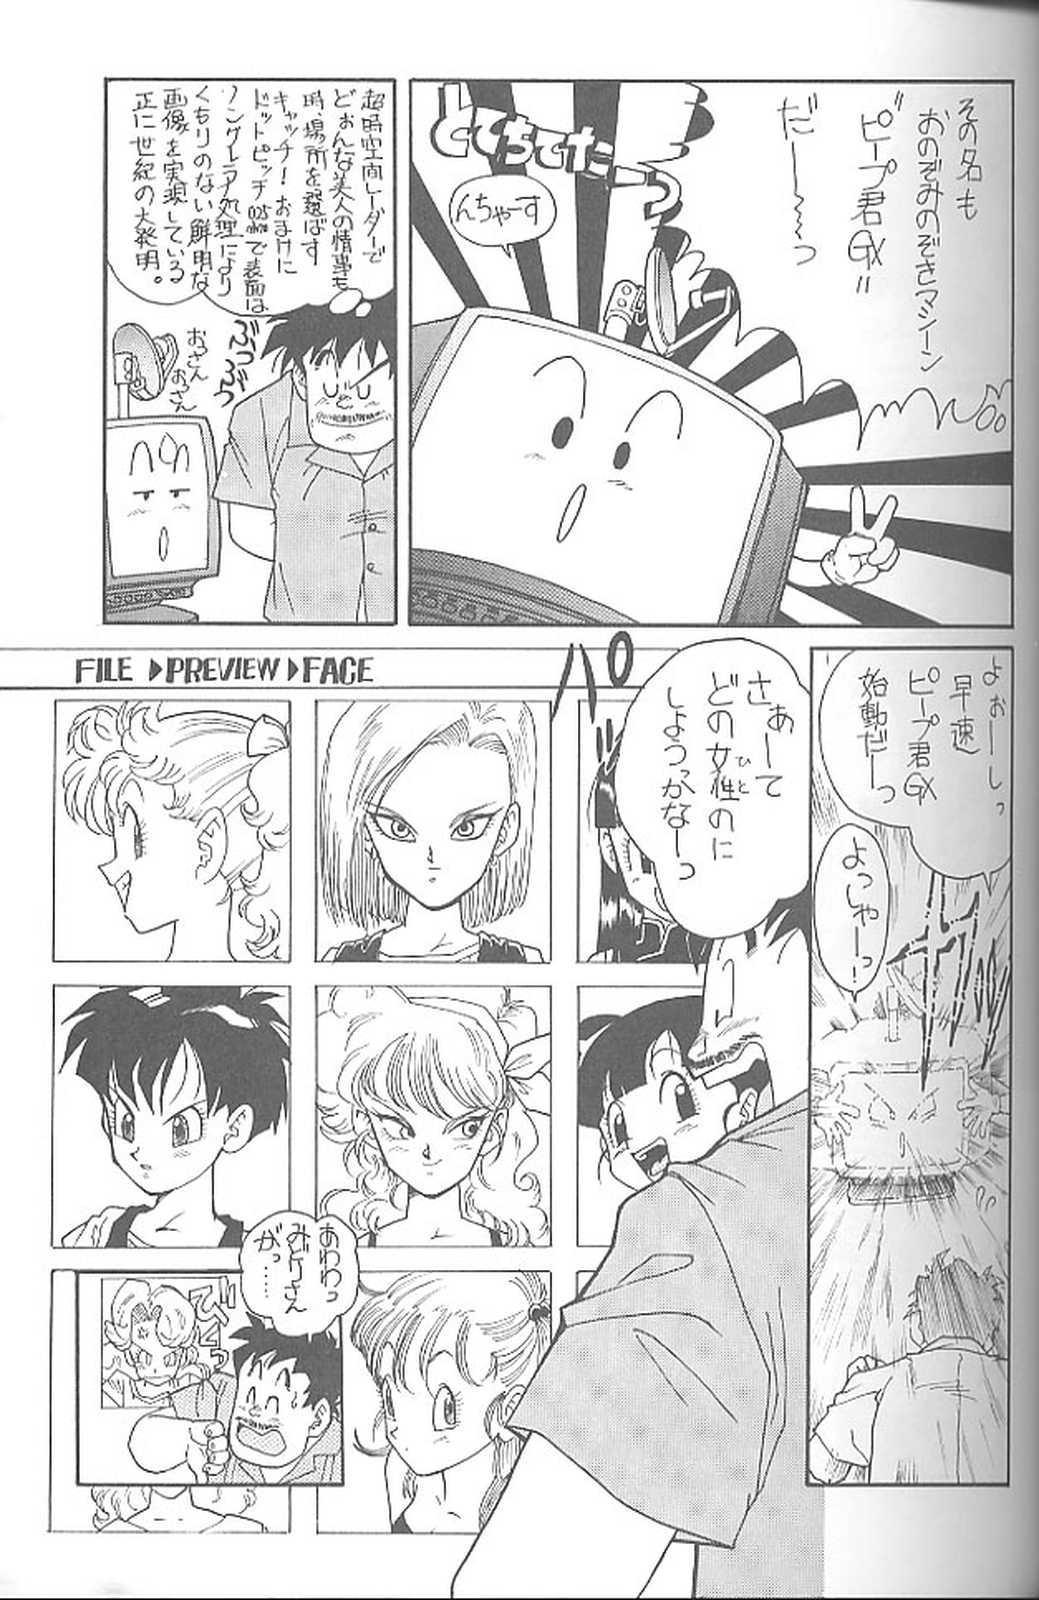 Haraharatokei vol.4 5